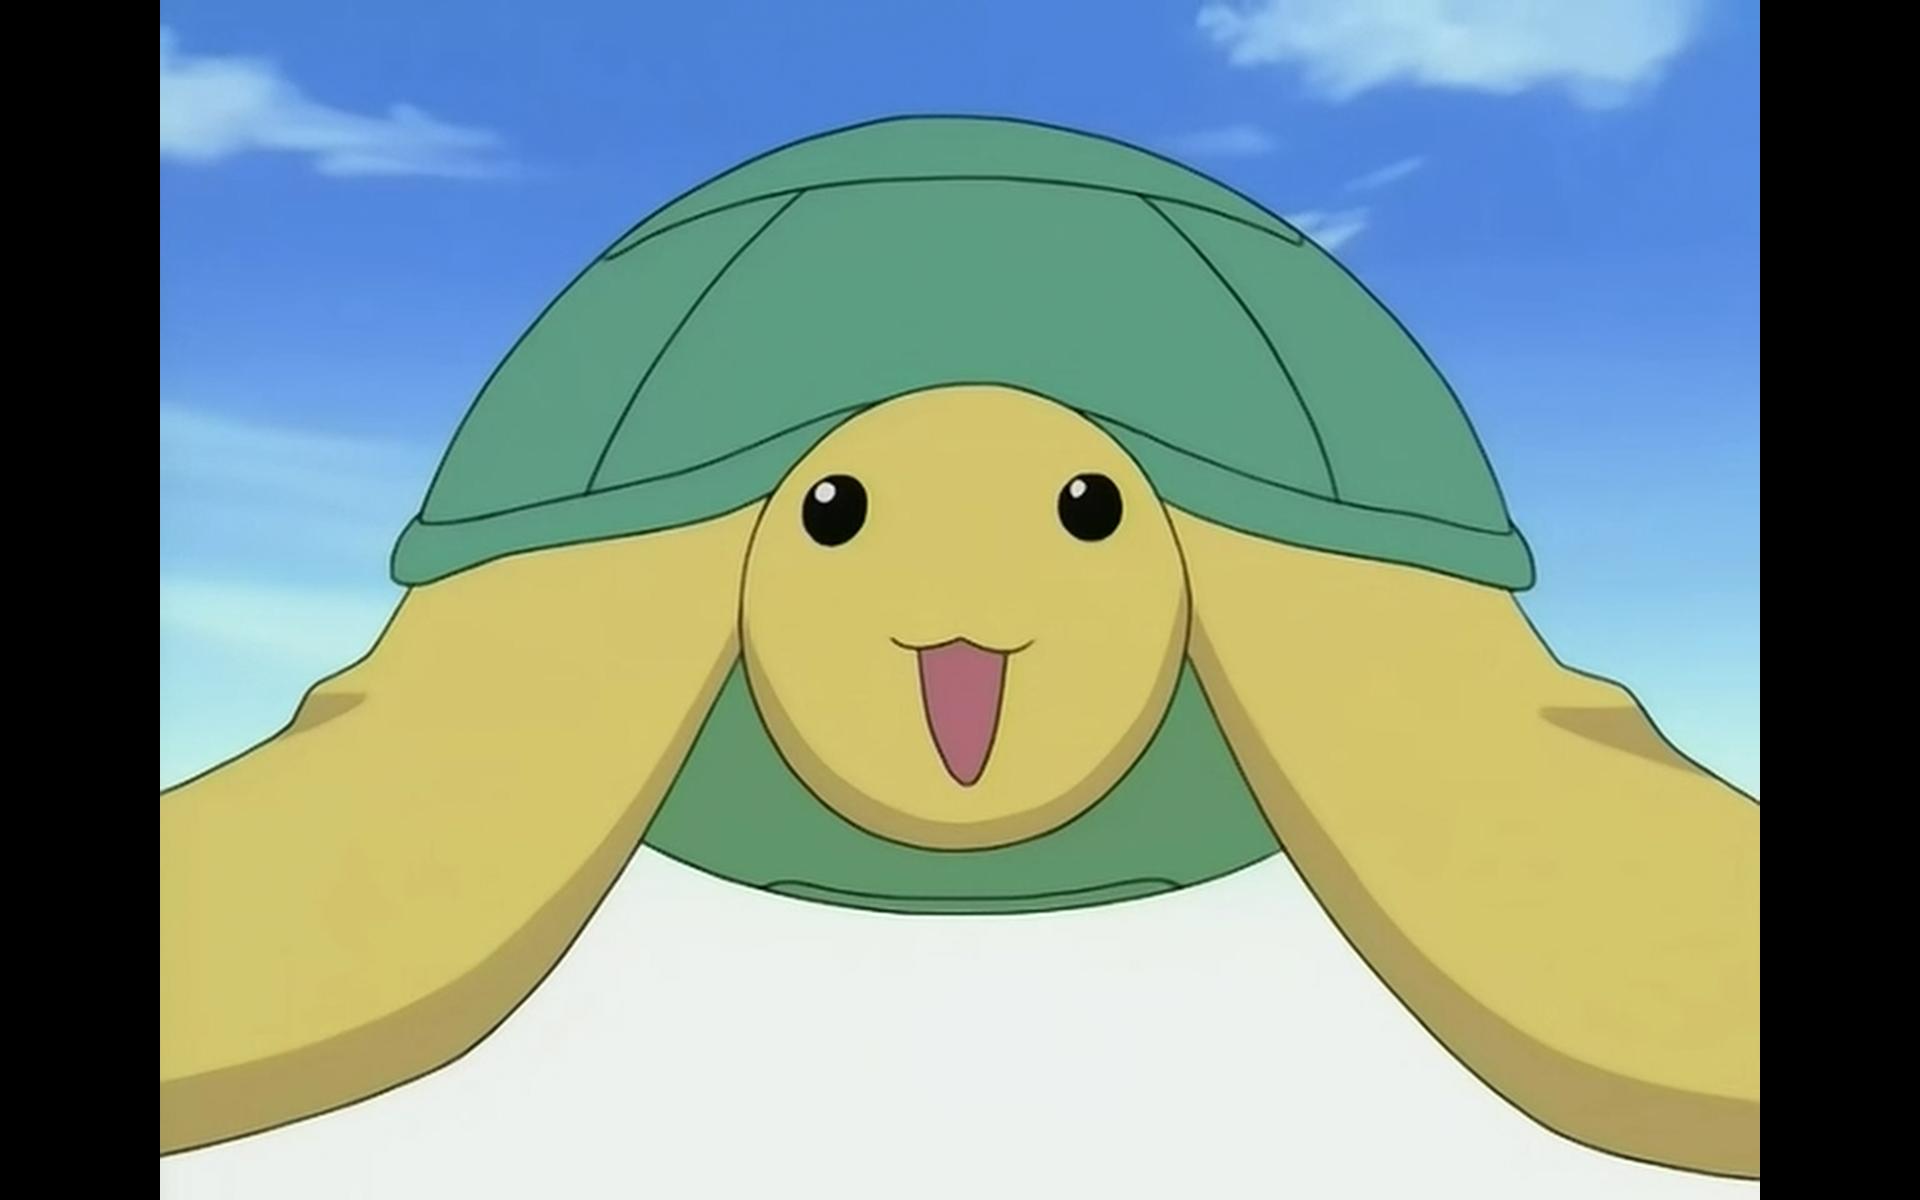 Аниме картинки с черепахой